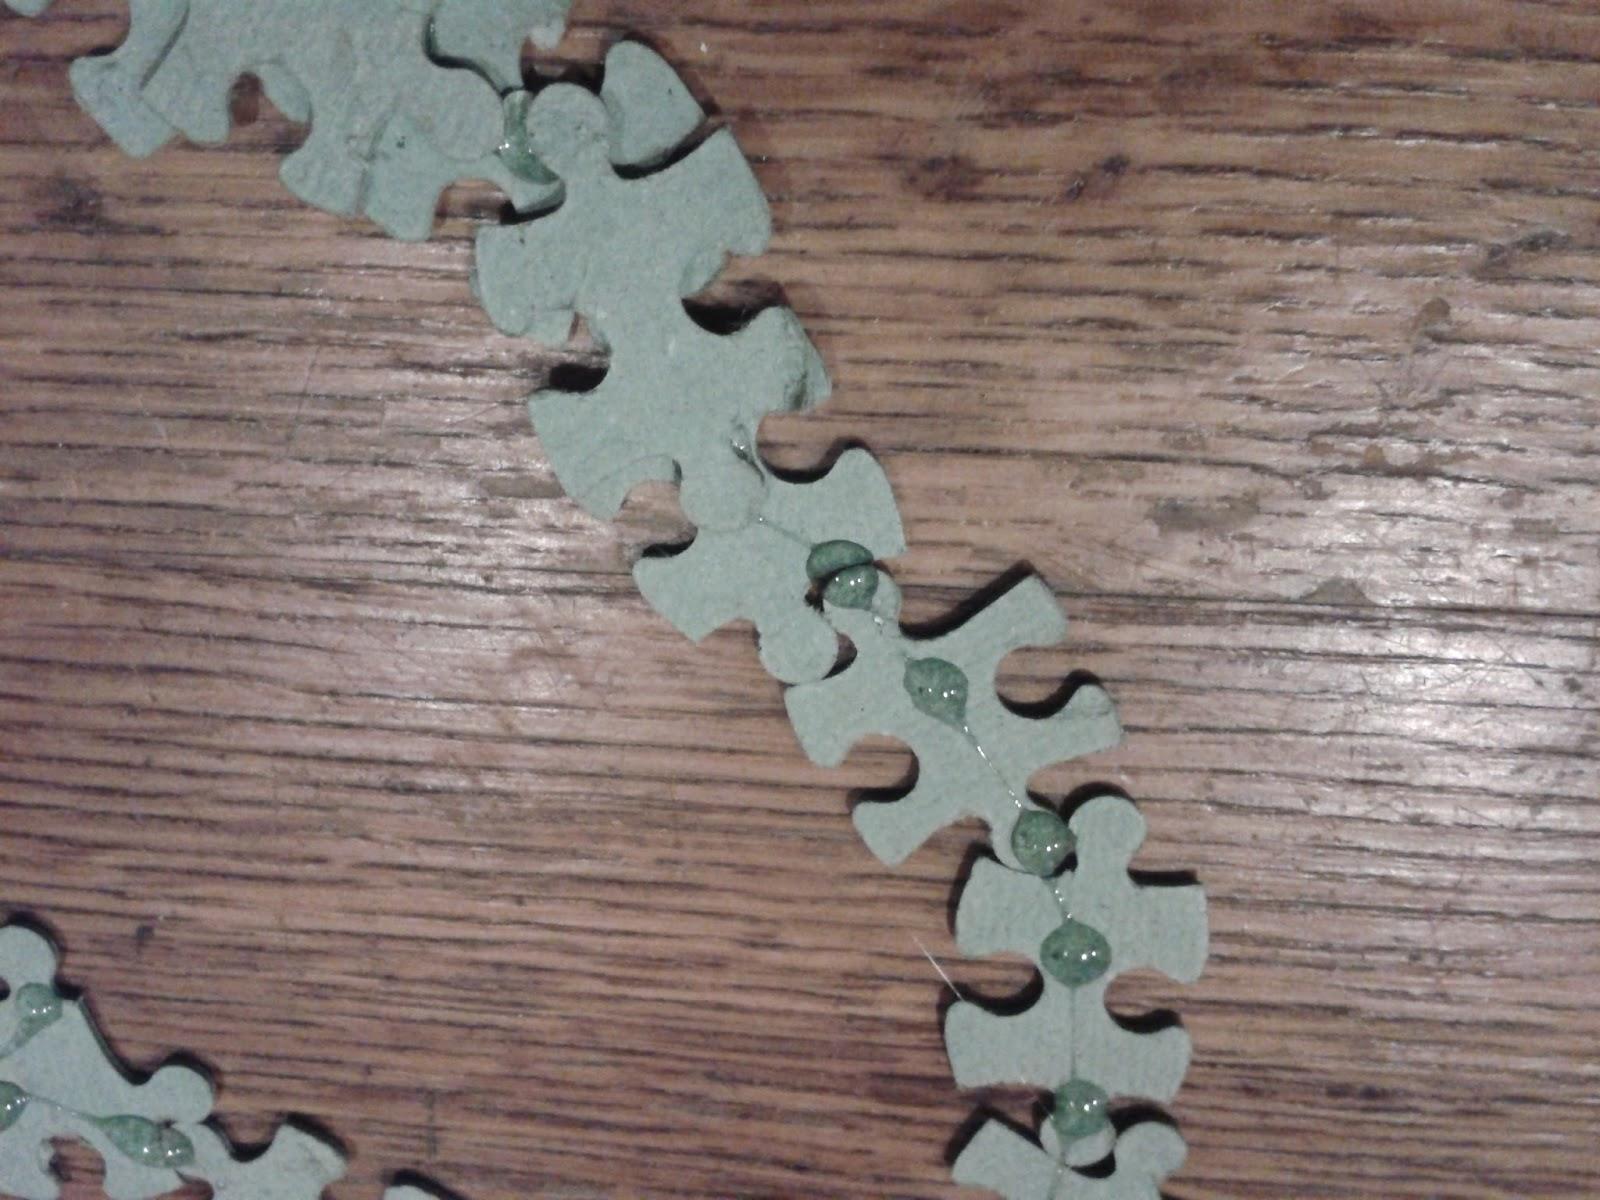 2014 03 18+20.16.49 - Hartje van puzzels